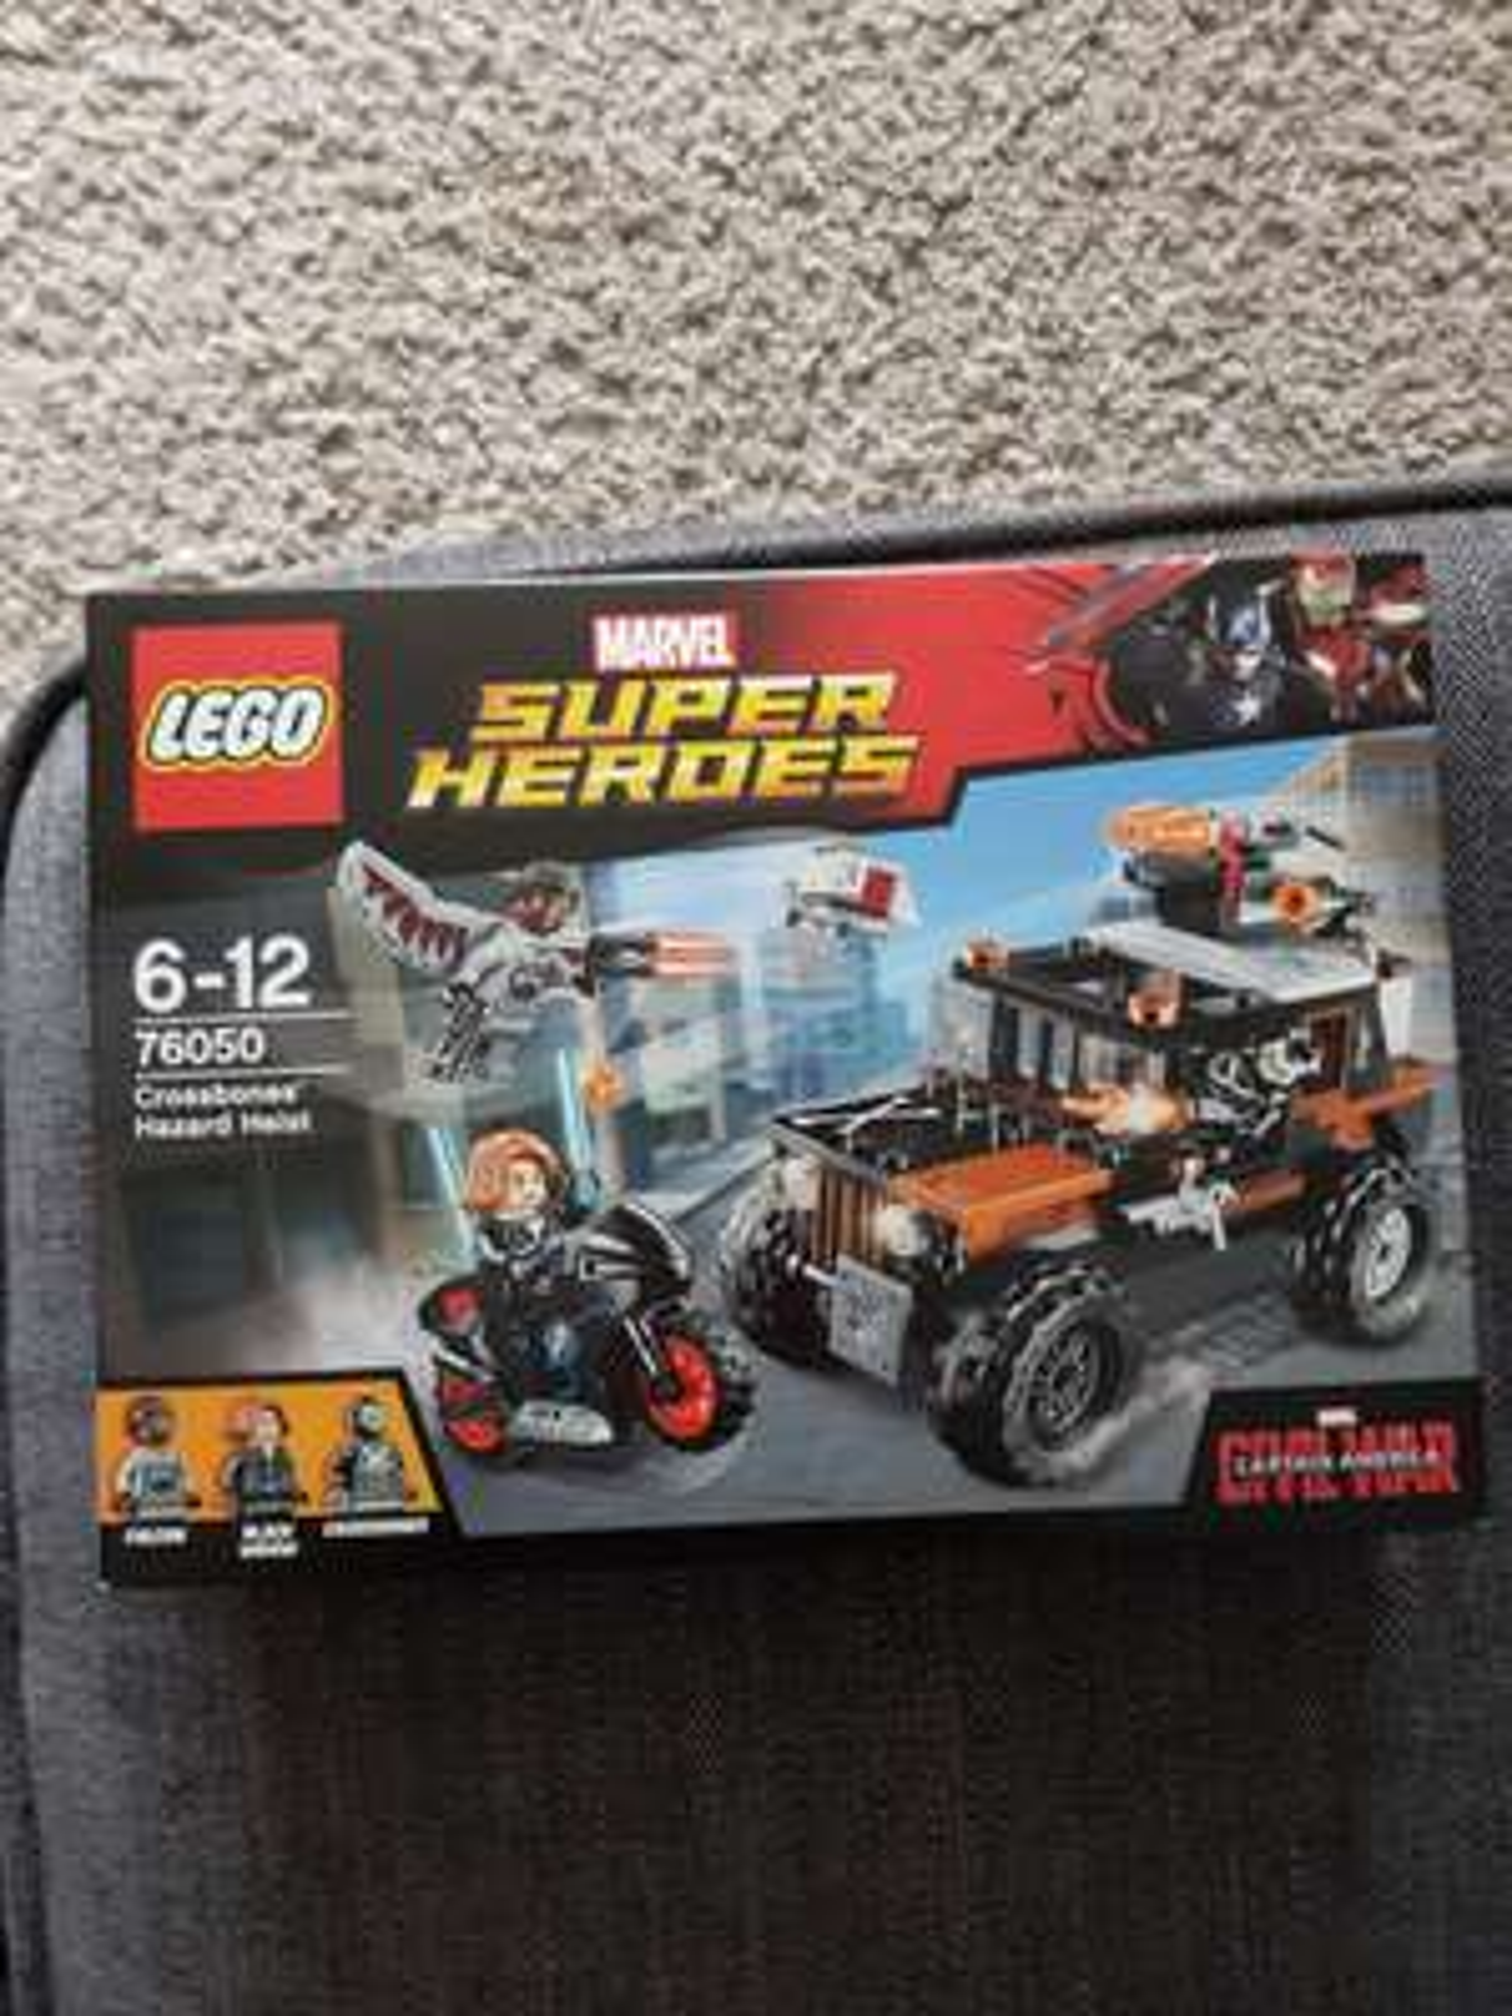 Various lego reduced in Debenhams instore